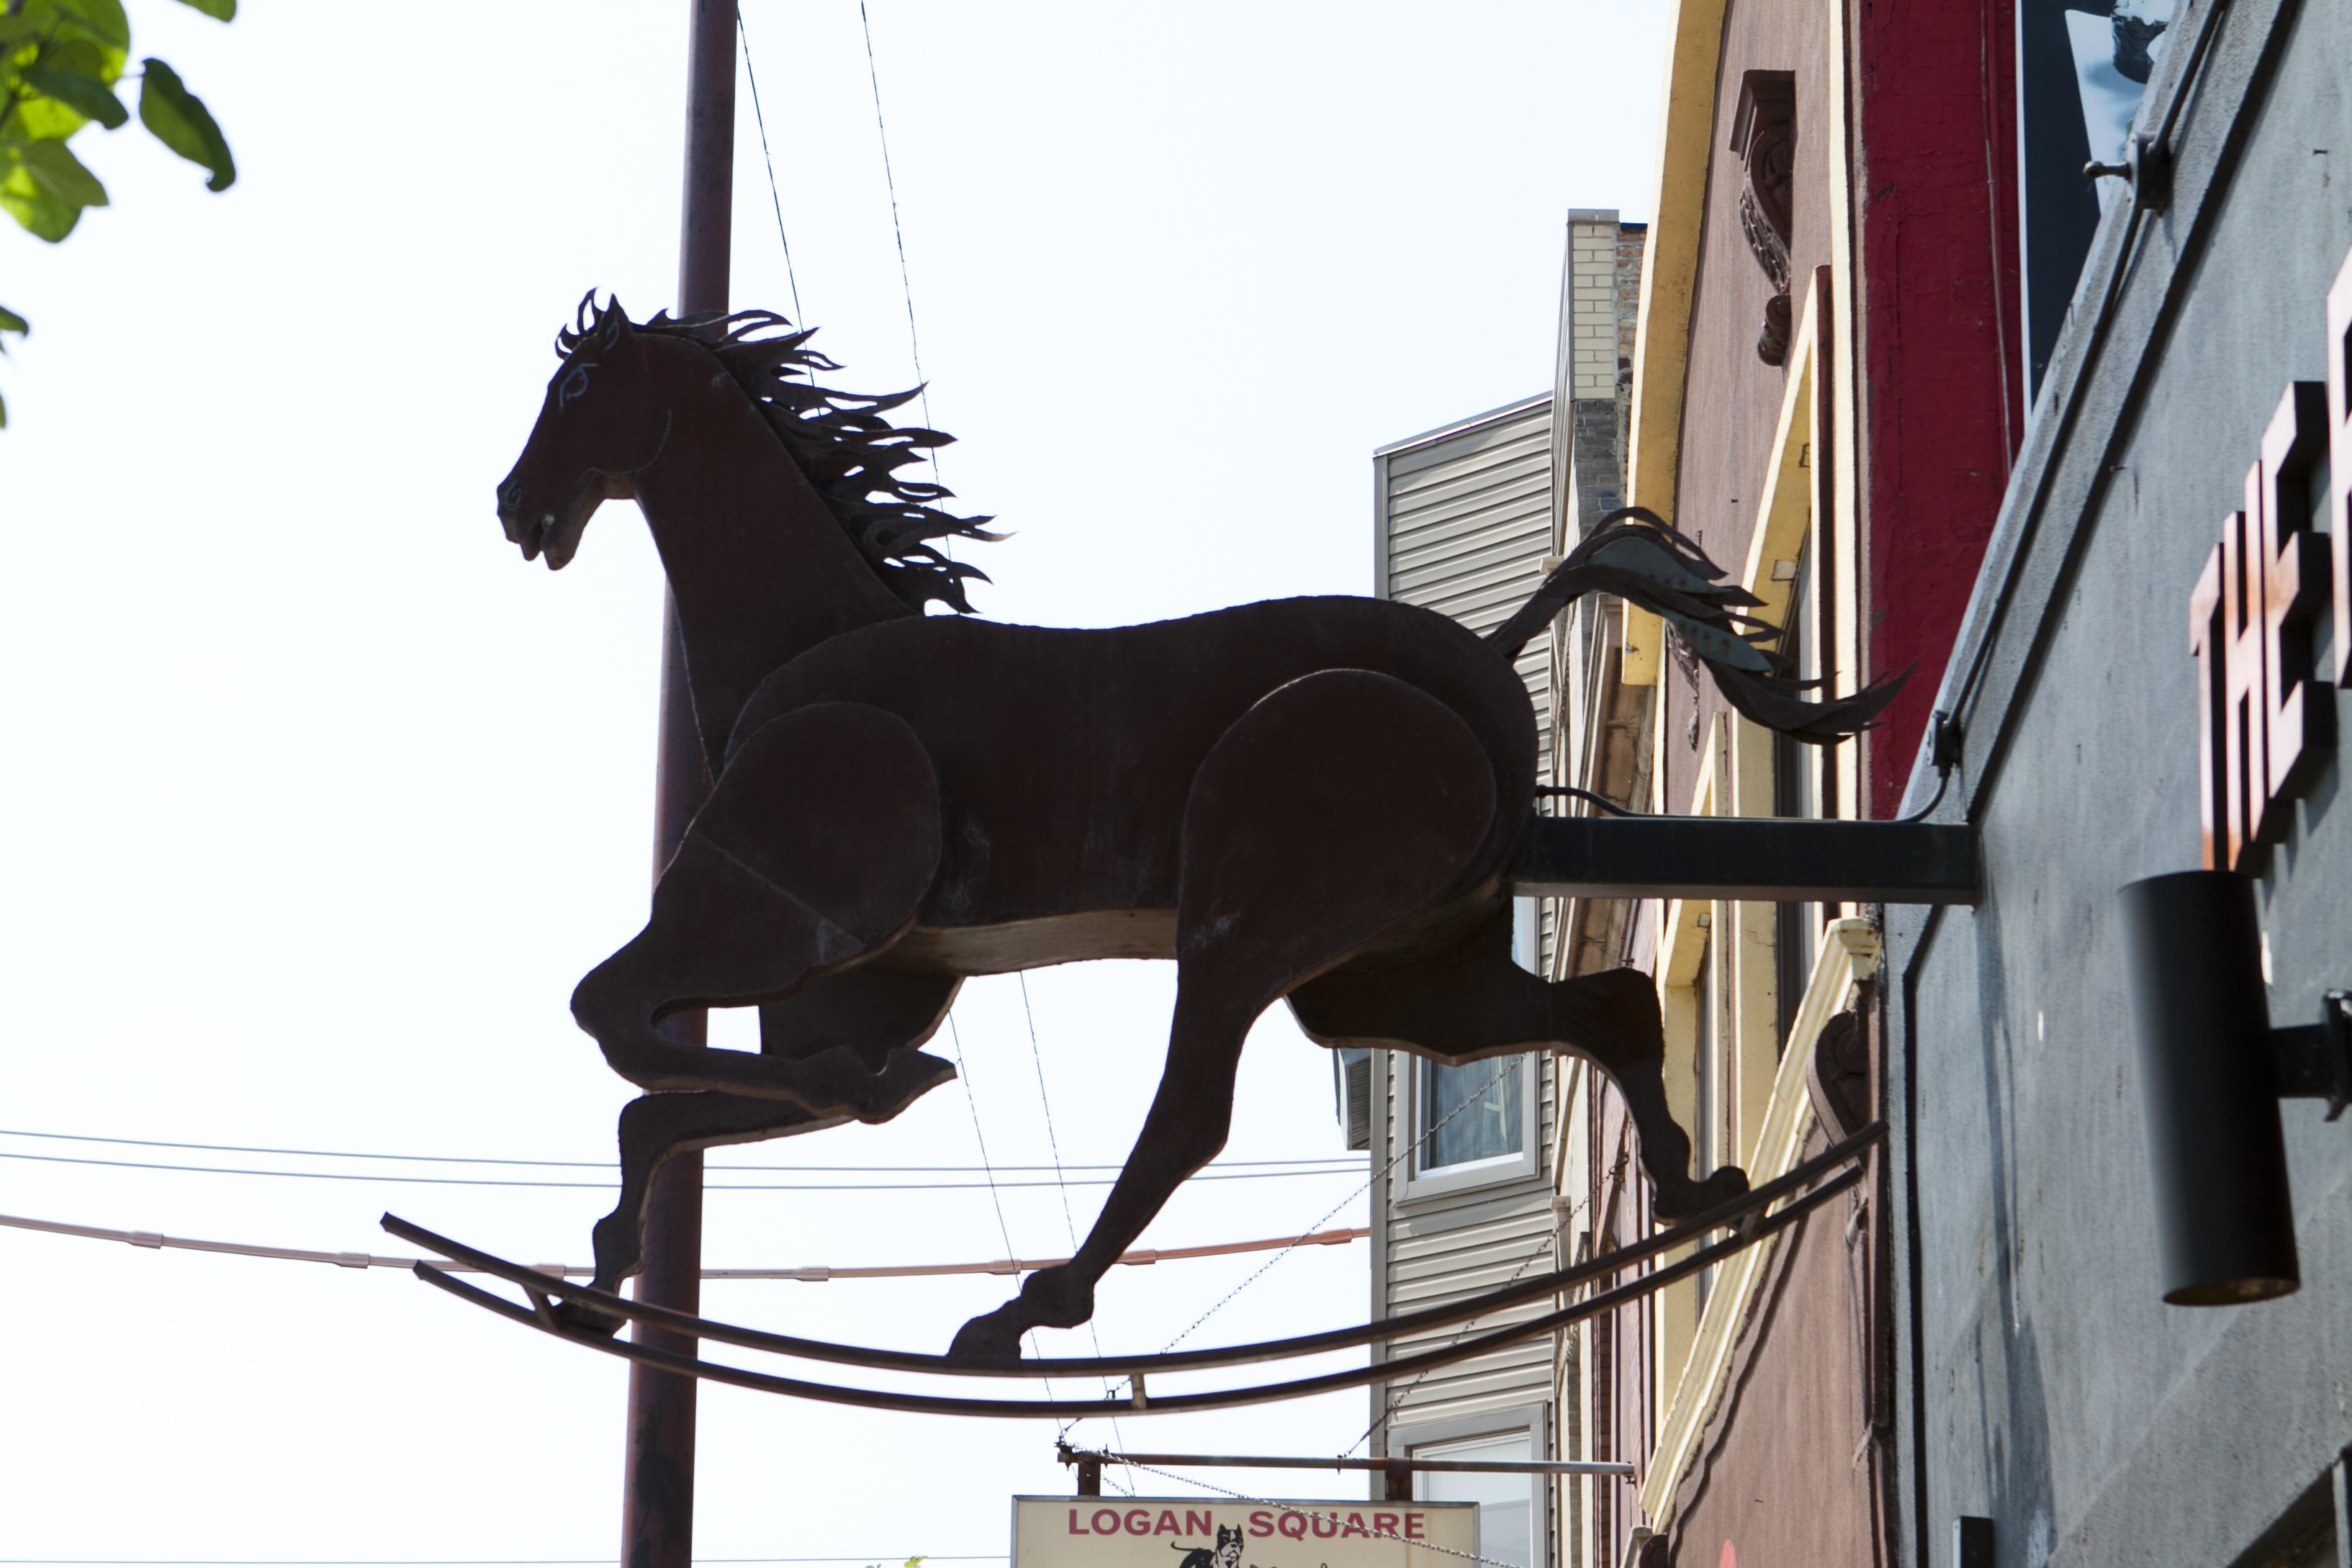 The_Rocking_Horse.jpg